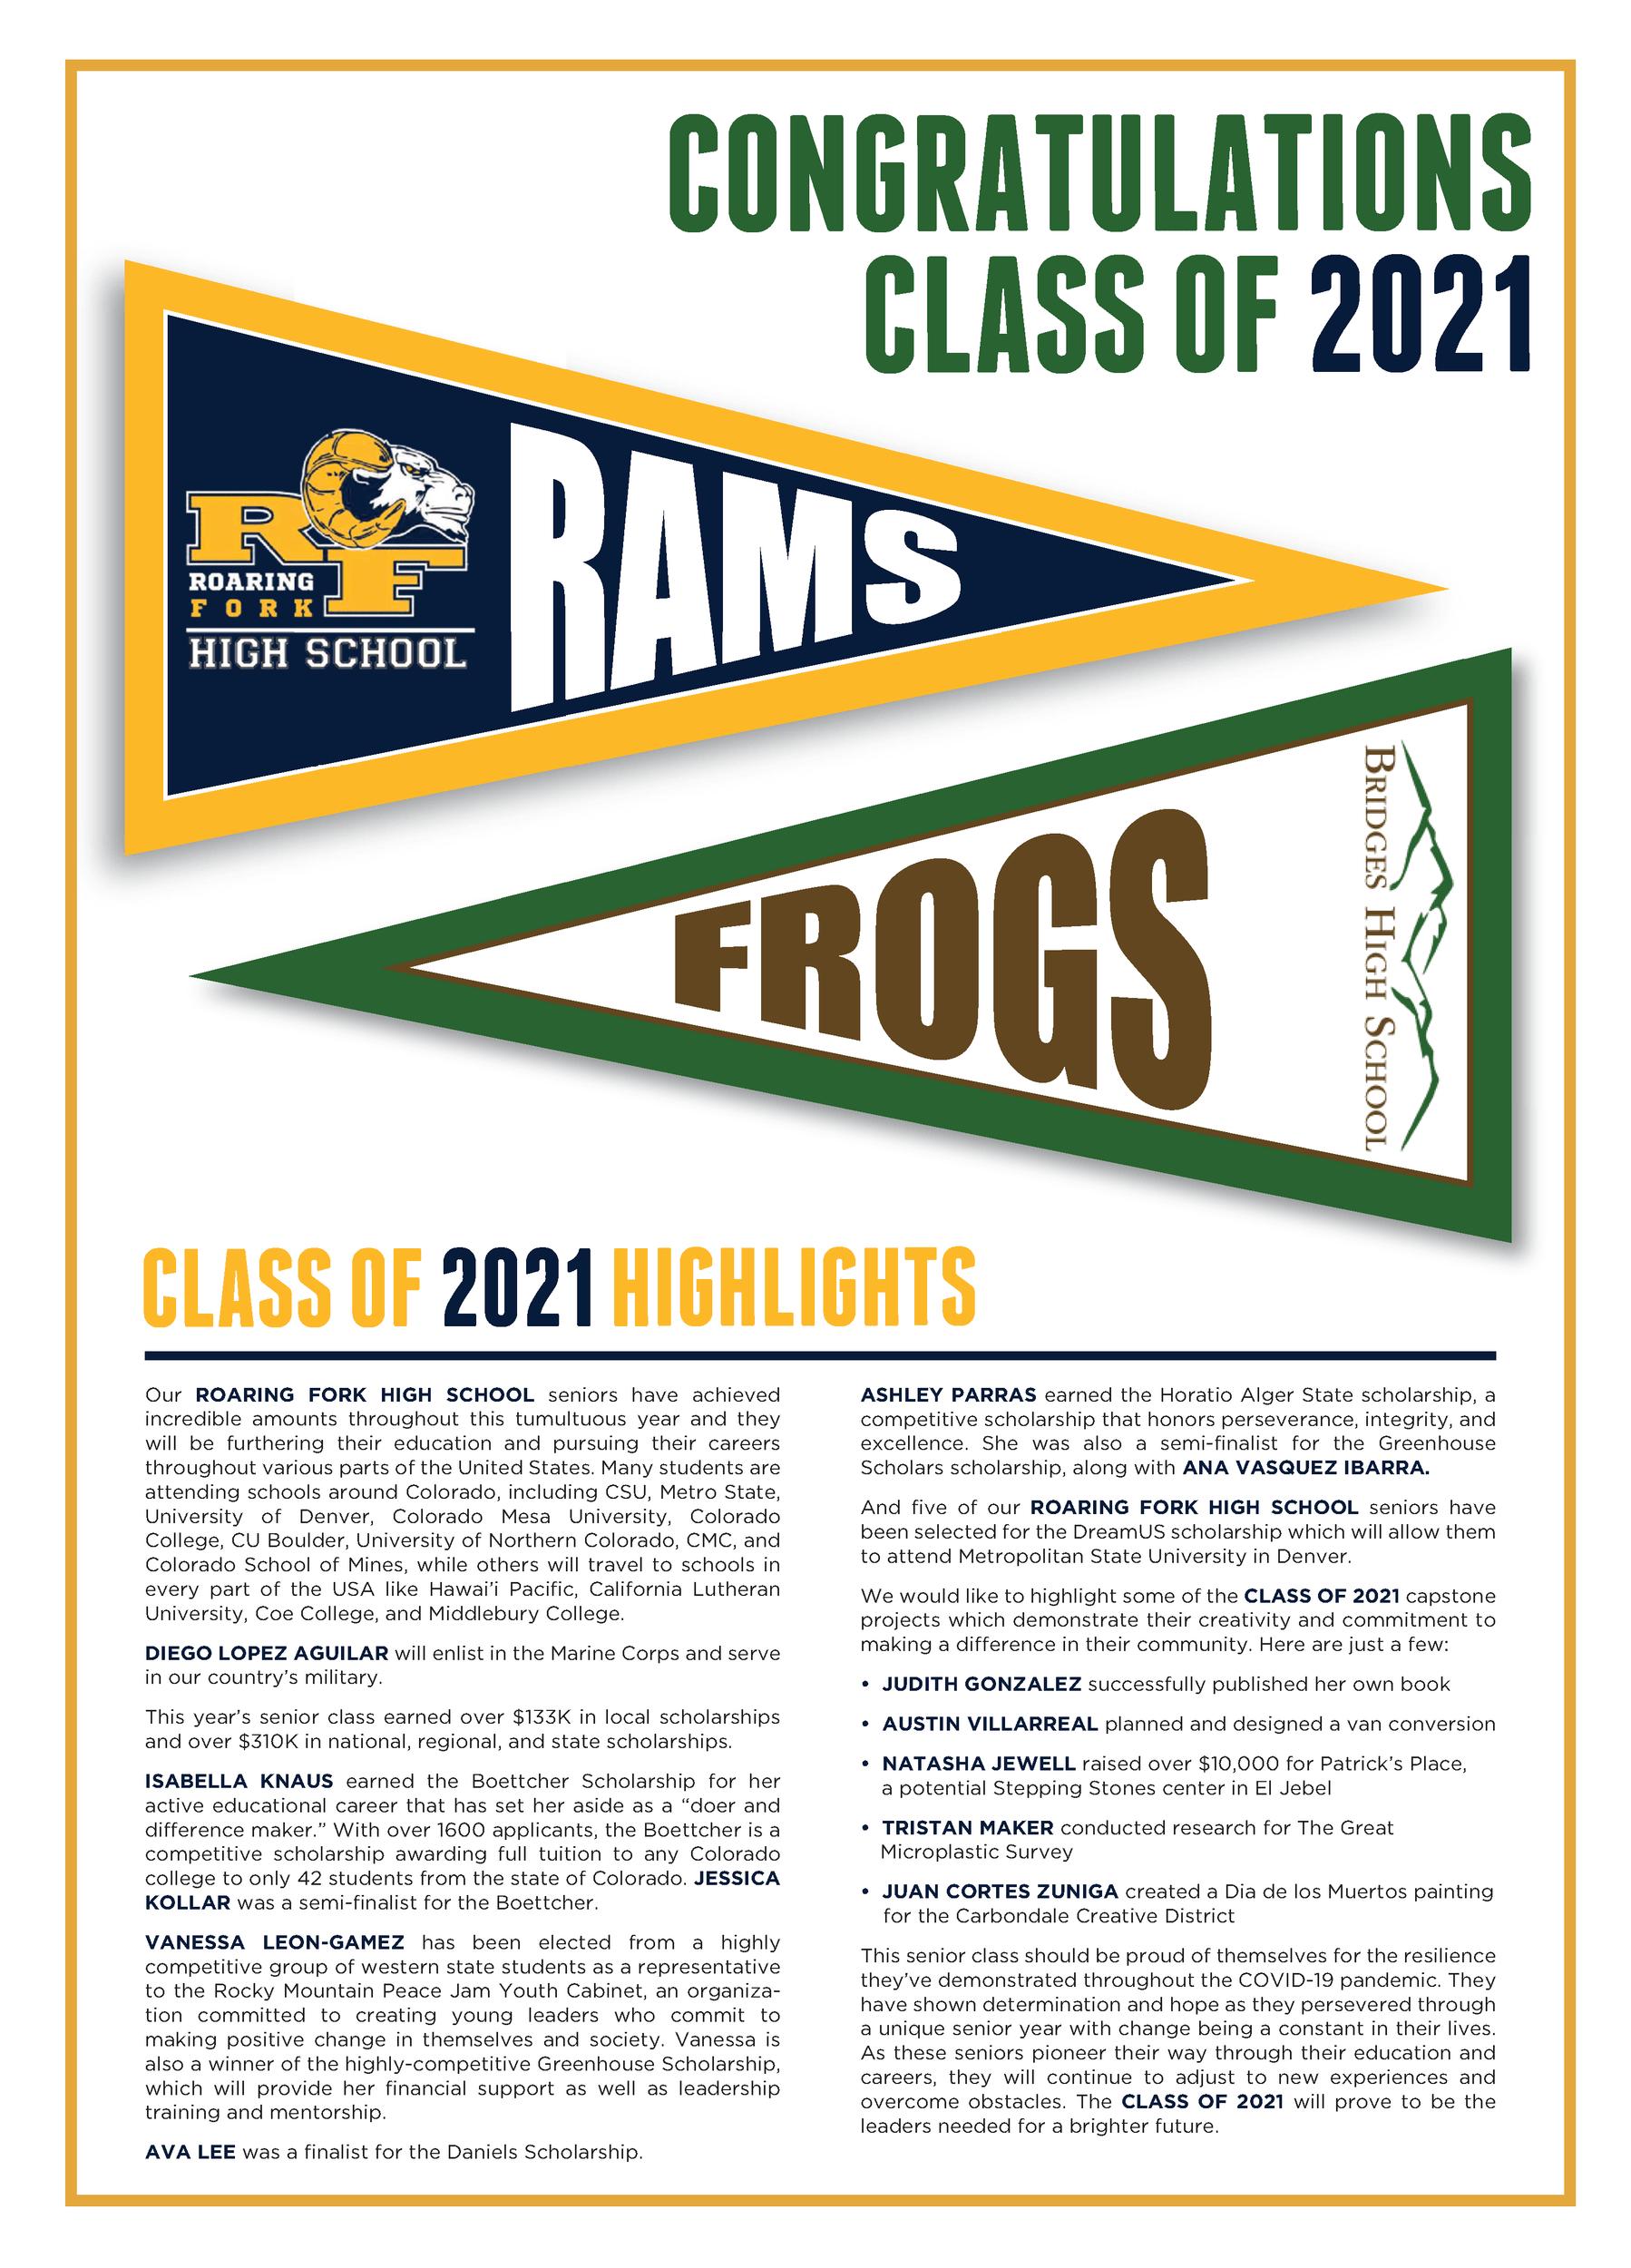 RFHS & Bridges Classes of 2021 thumbnail